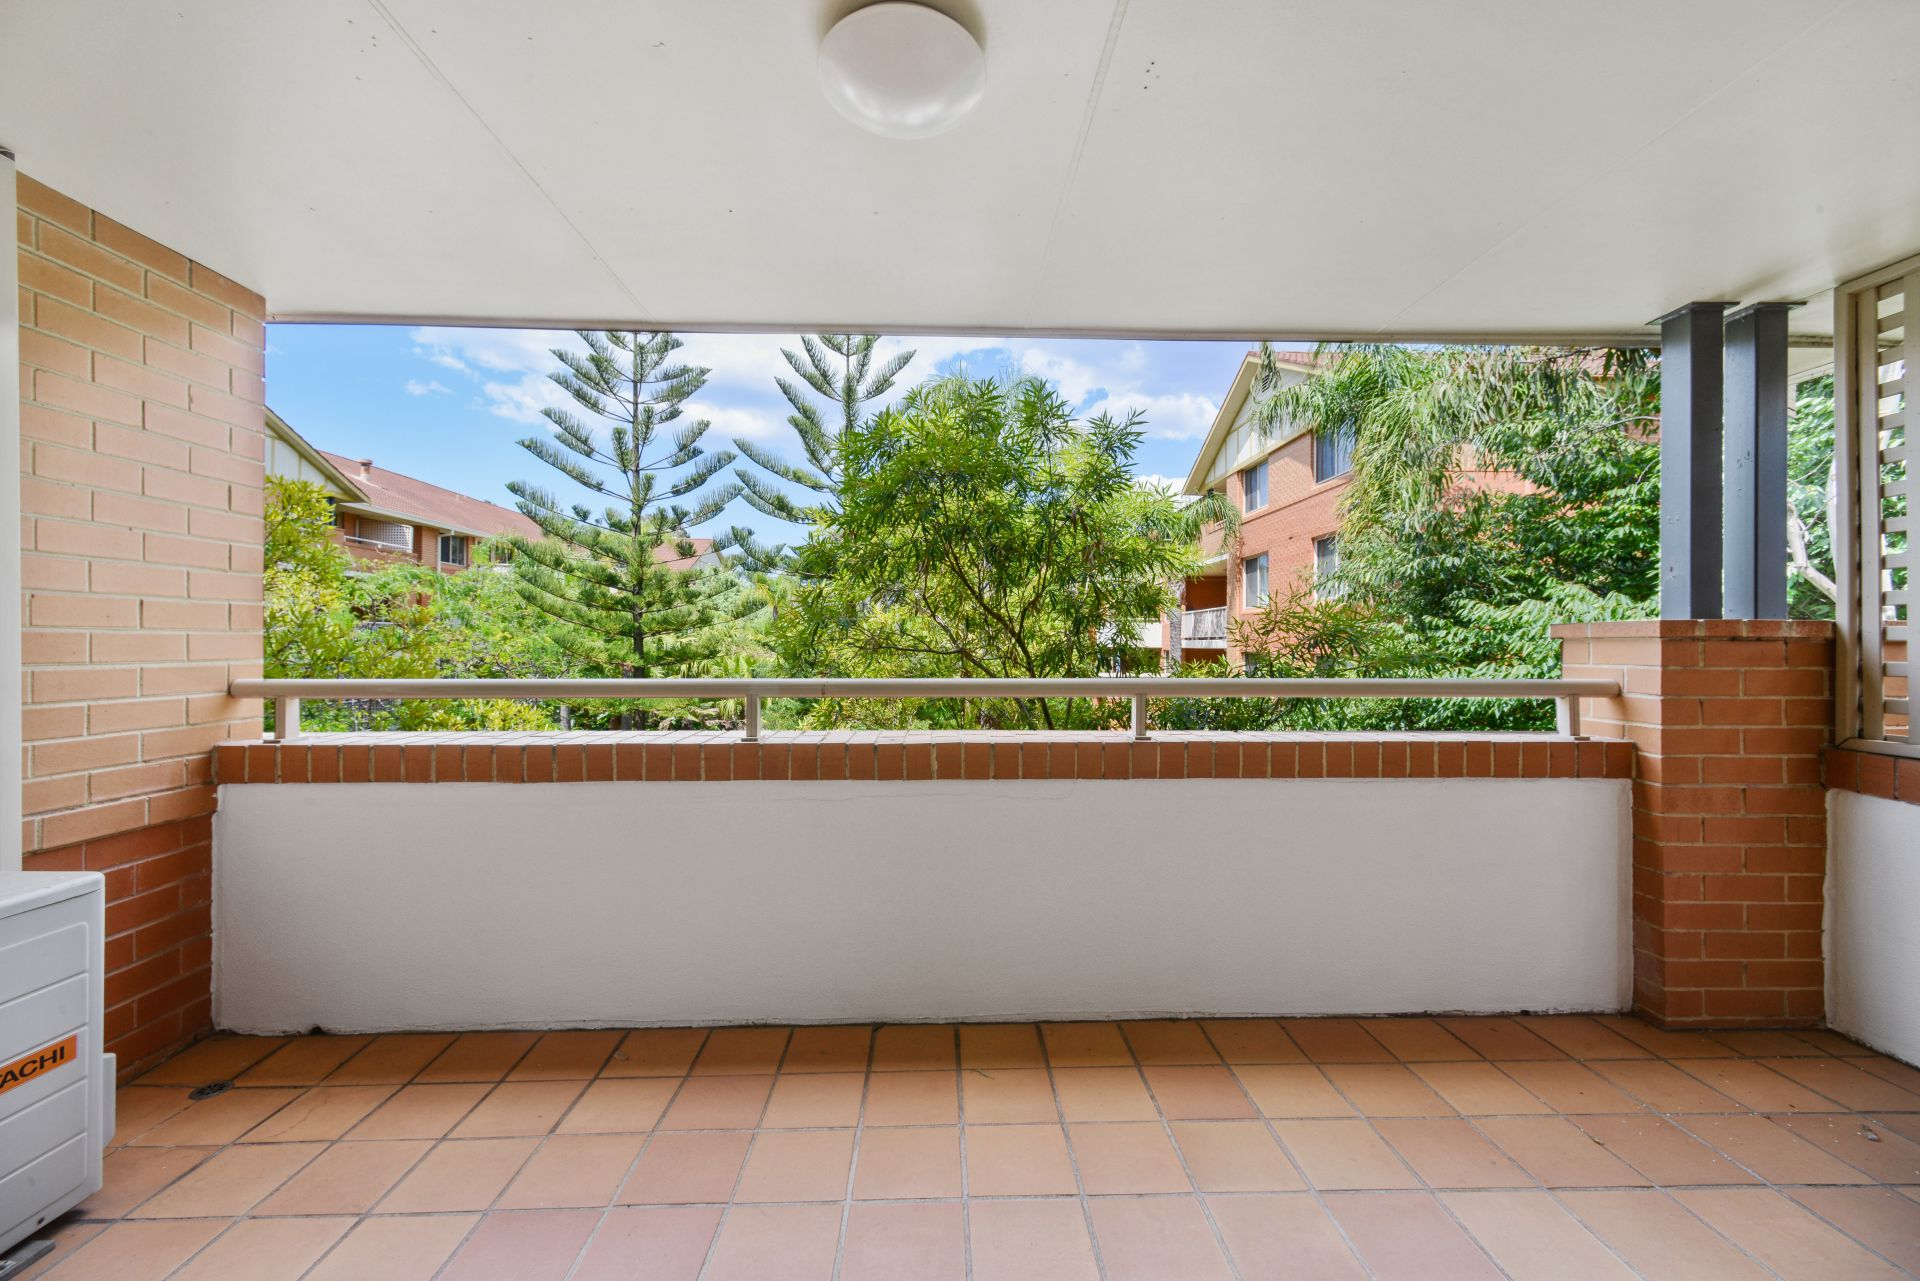 23A/19-21 George Street, North Strathfield NSW 2137